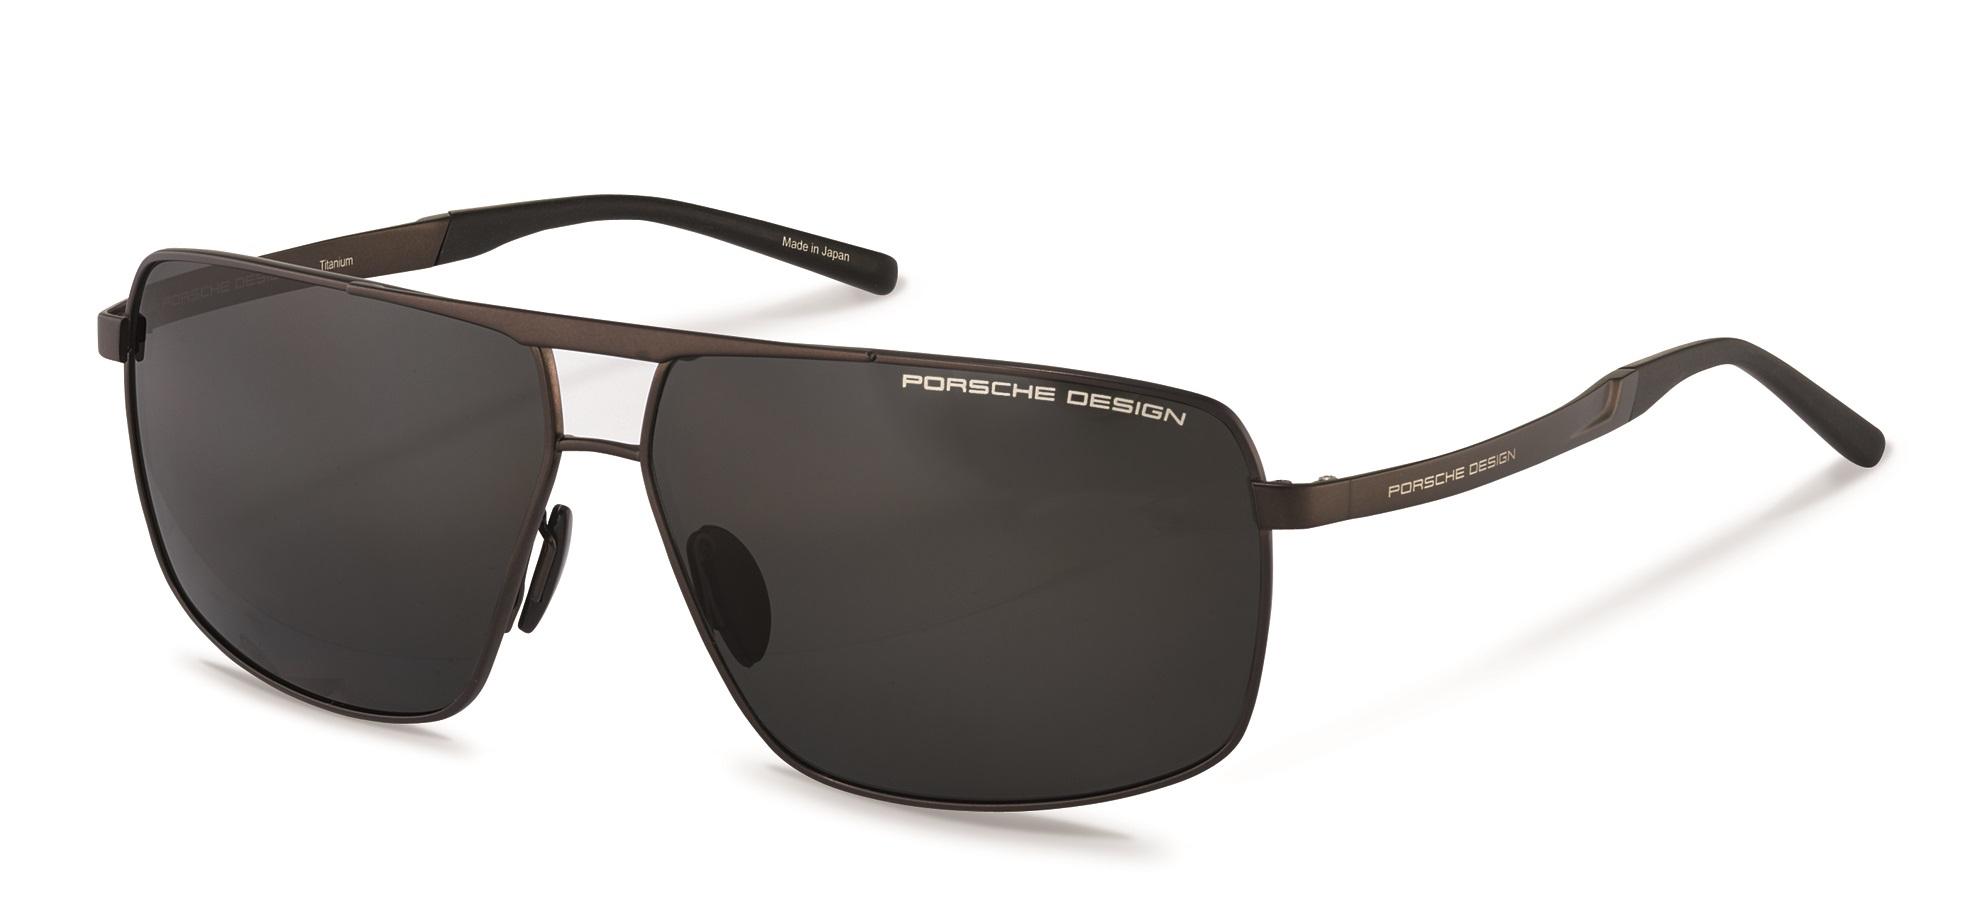 570e694768a Porsche Design-Sunglasses-P8658-black